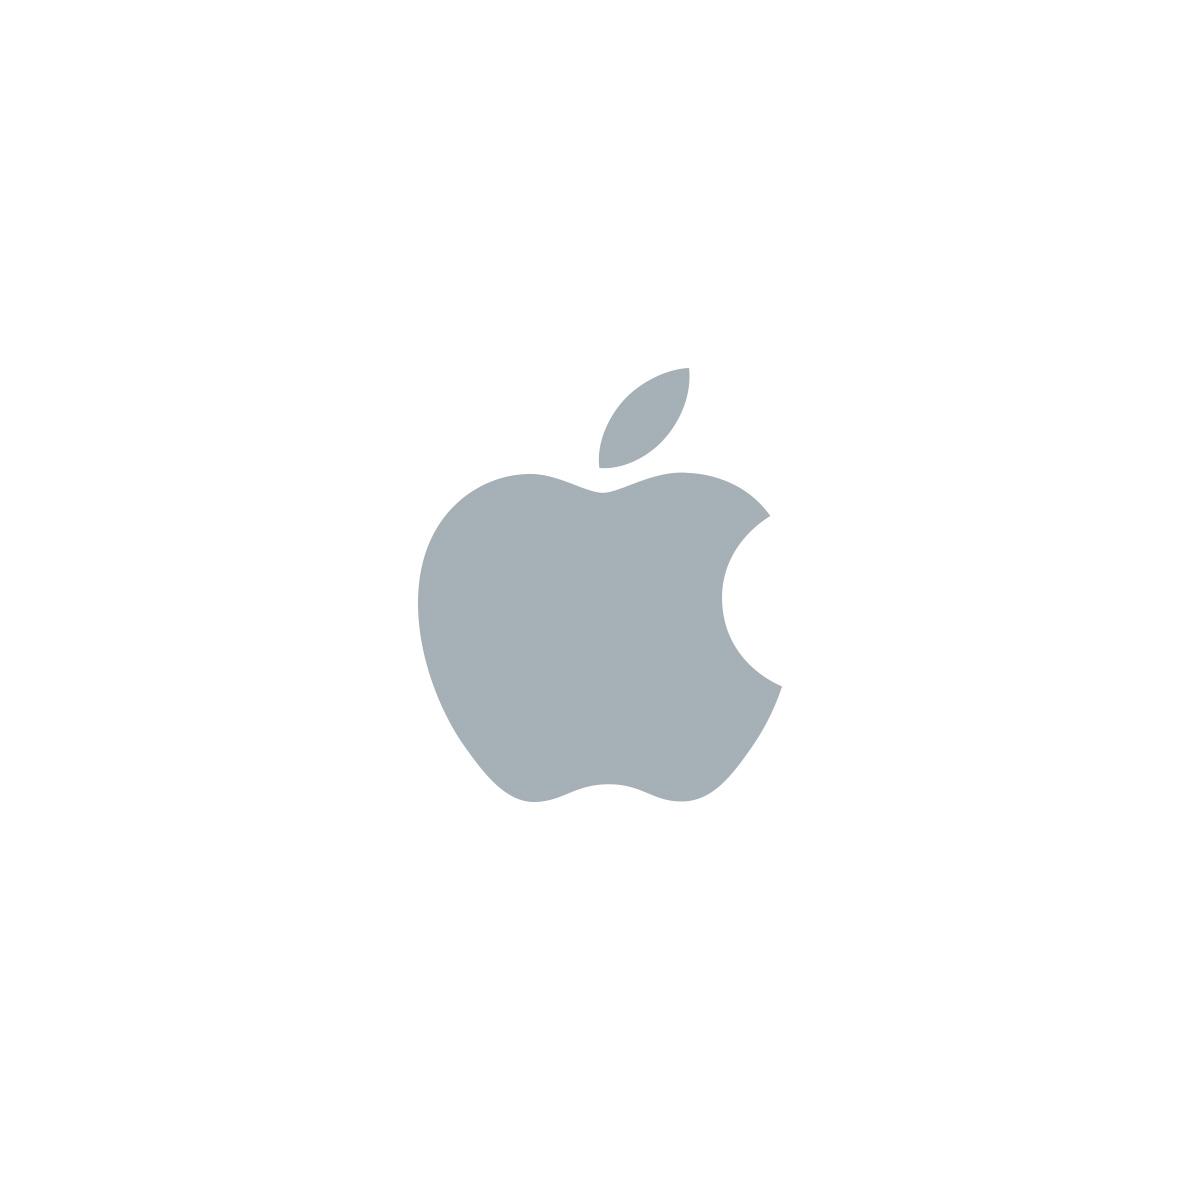 Itunes Para Iphone 4s Descargar Gratis